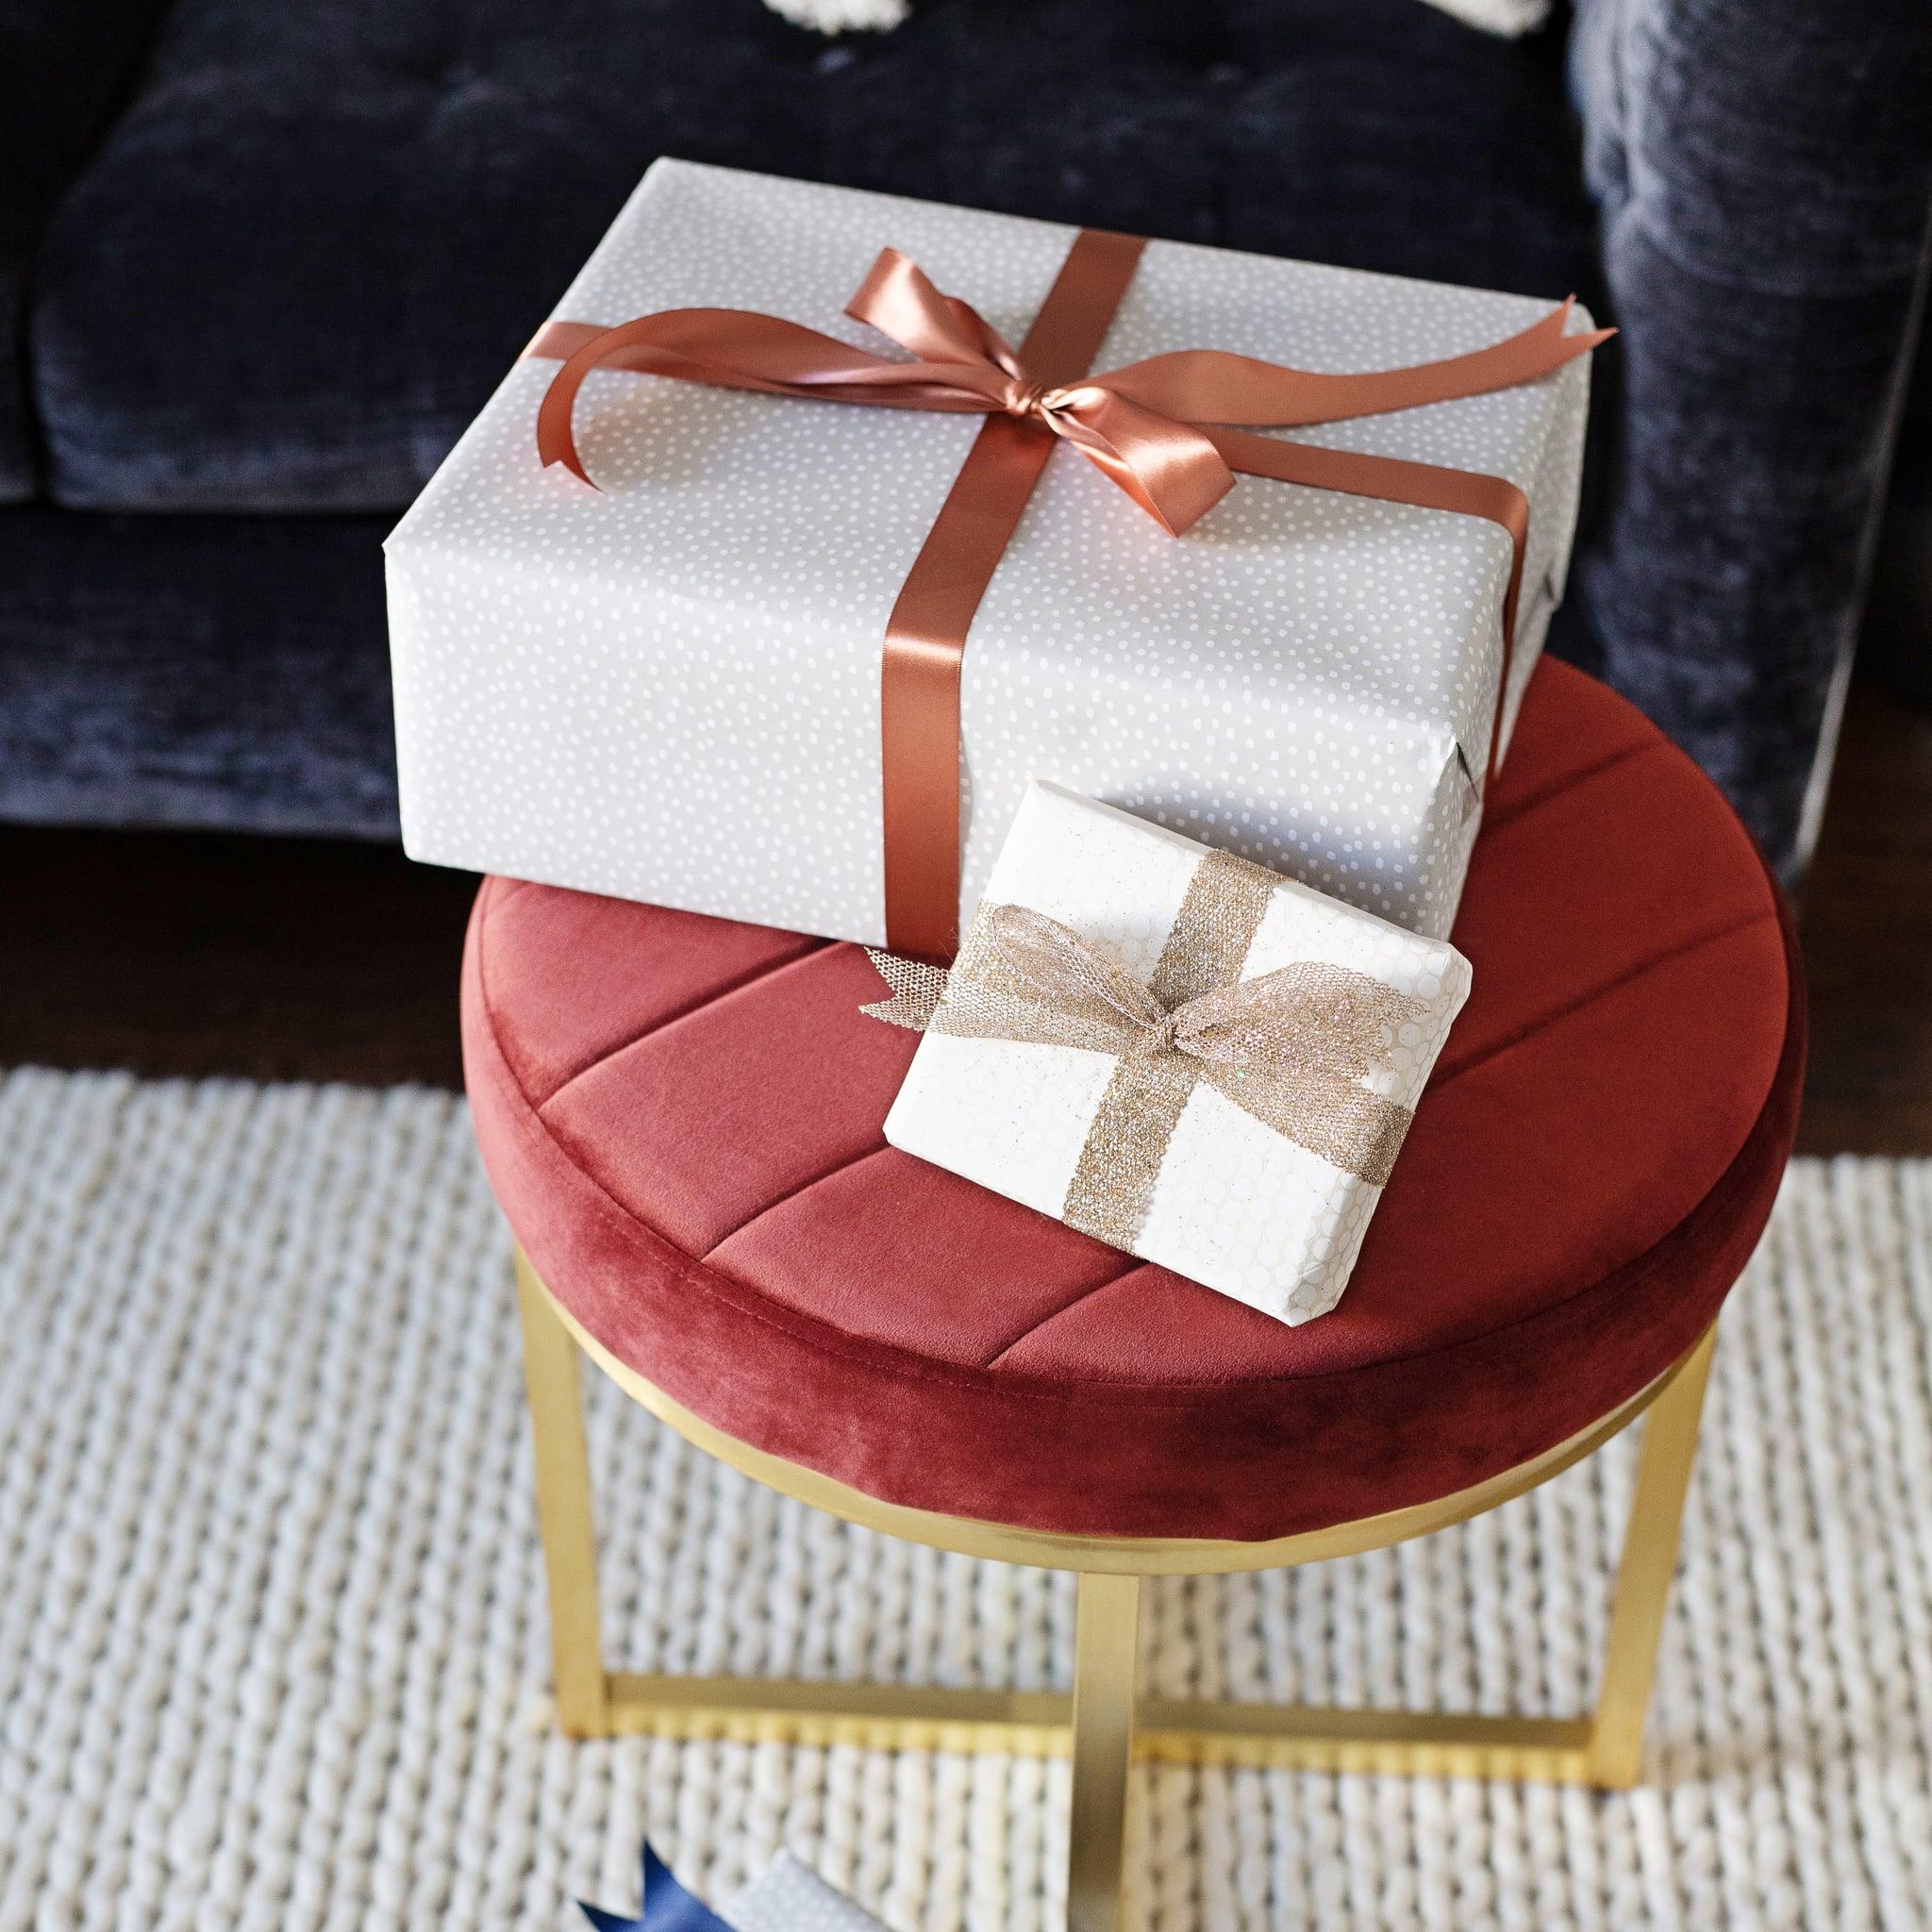 The Best Gifts For Women At Walmart In 2020 Popsugar Love Sex